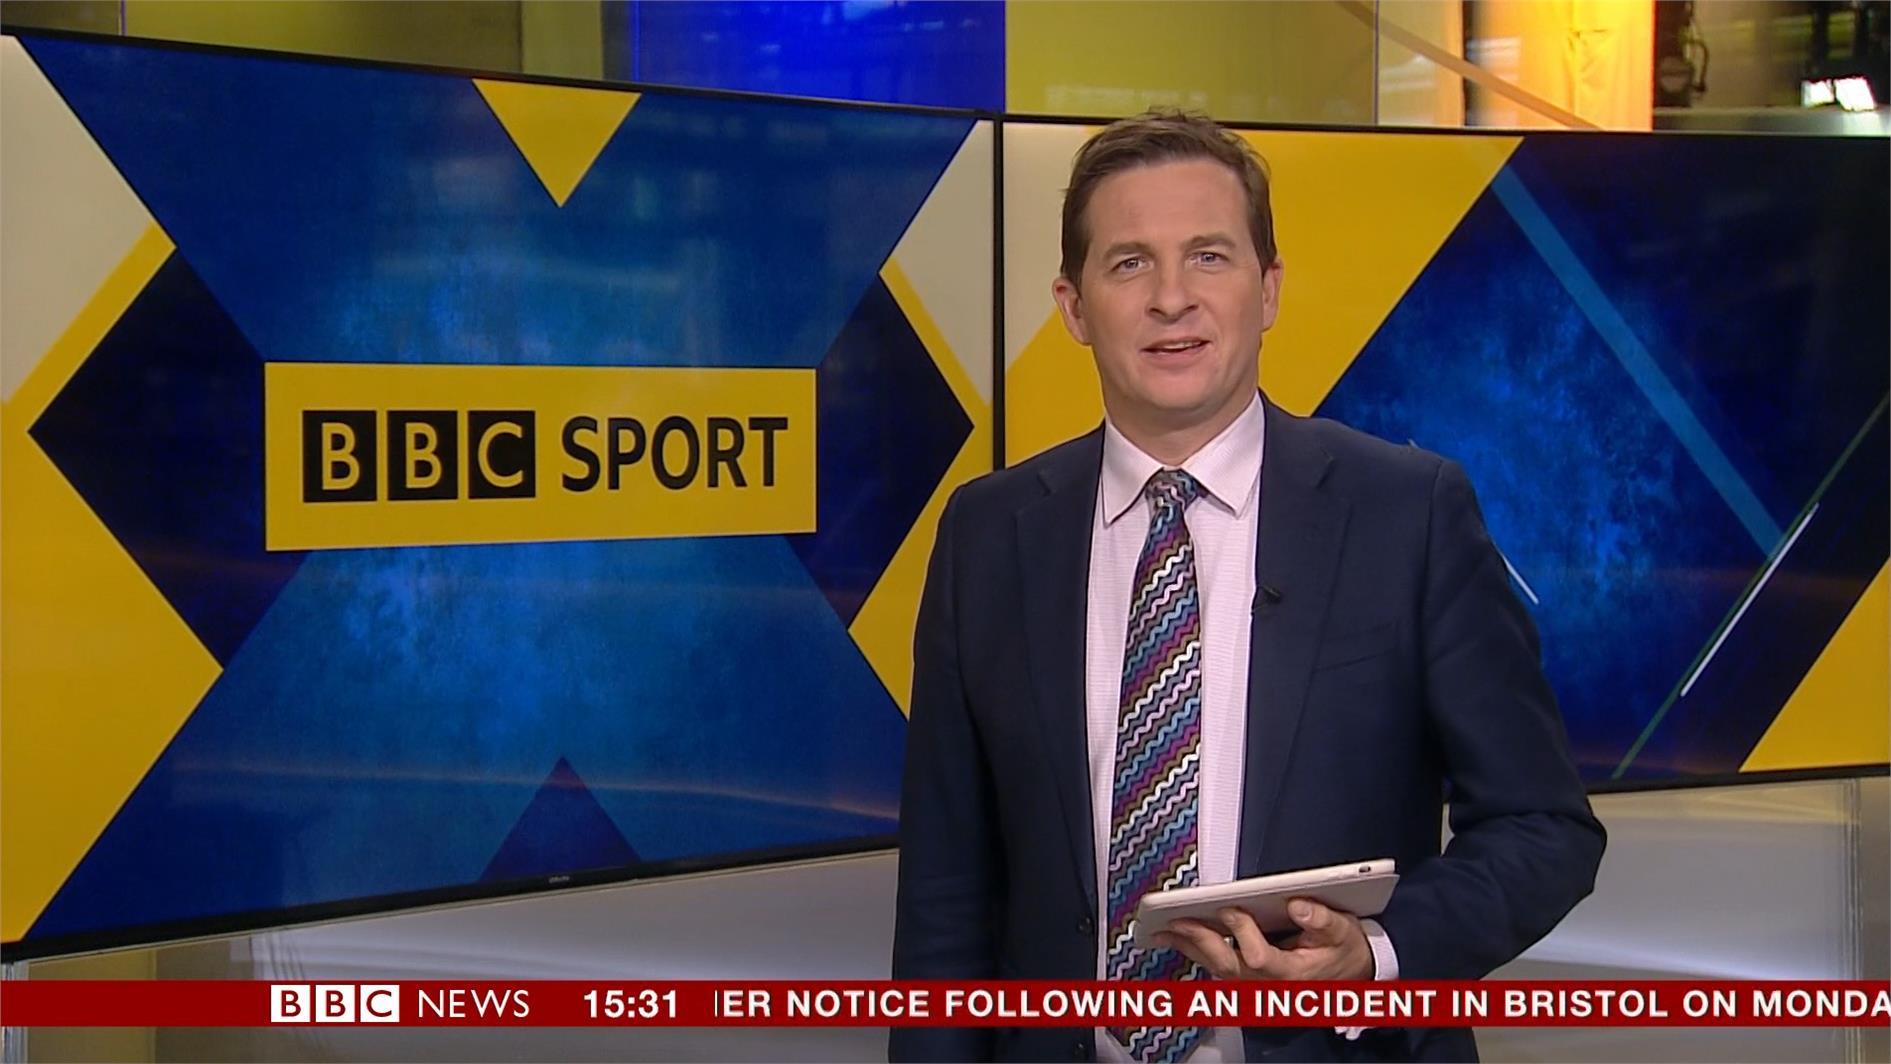 Olly Foster - BBC Sport Presenter (9)